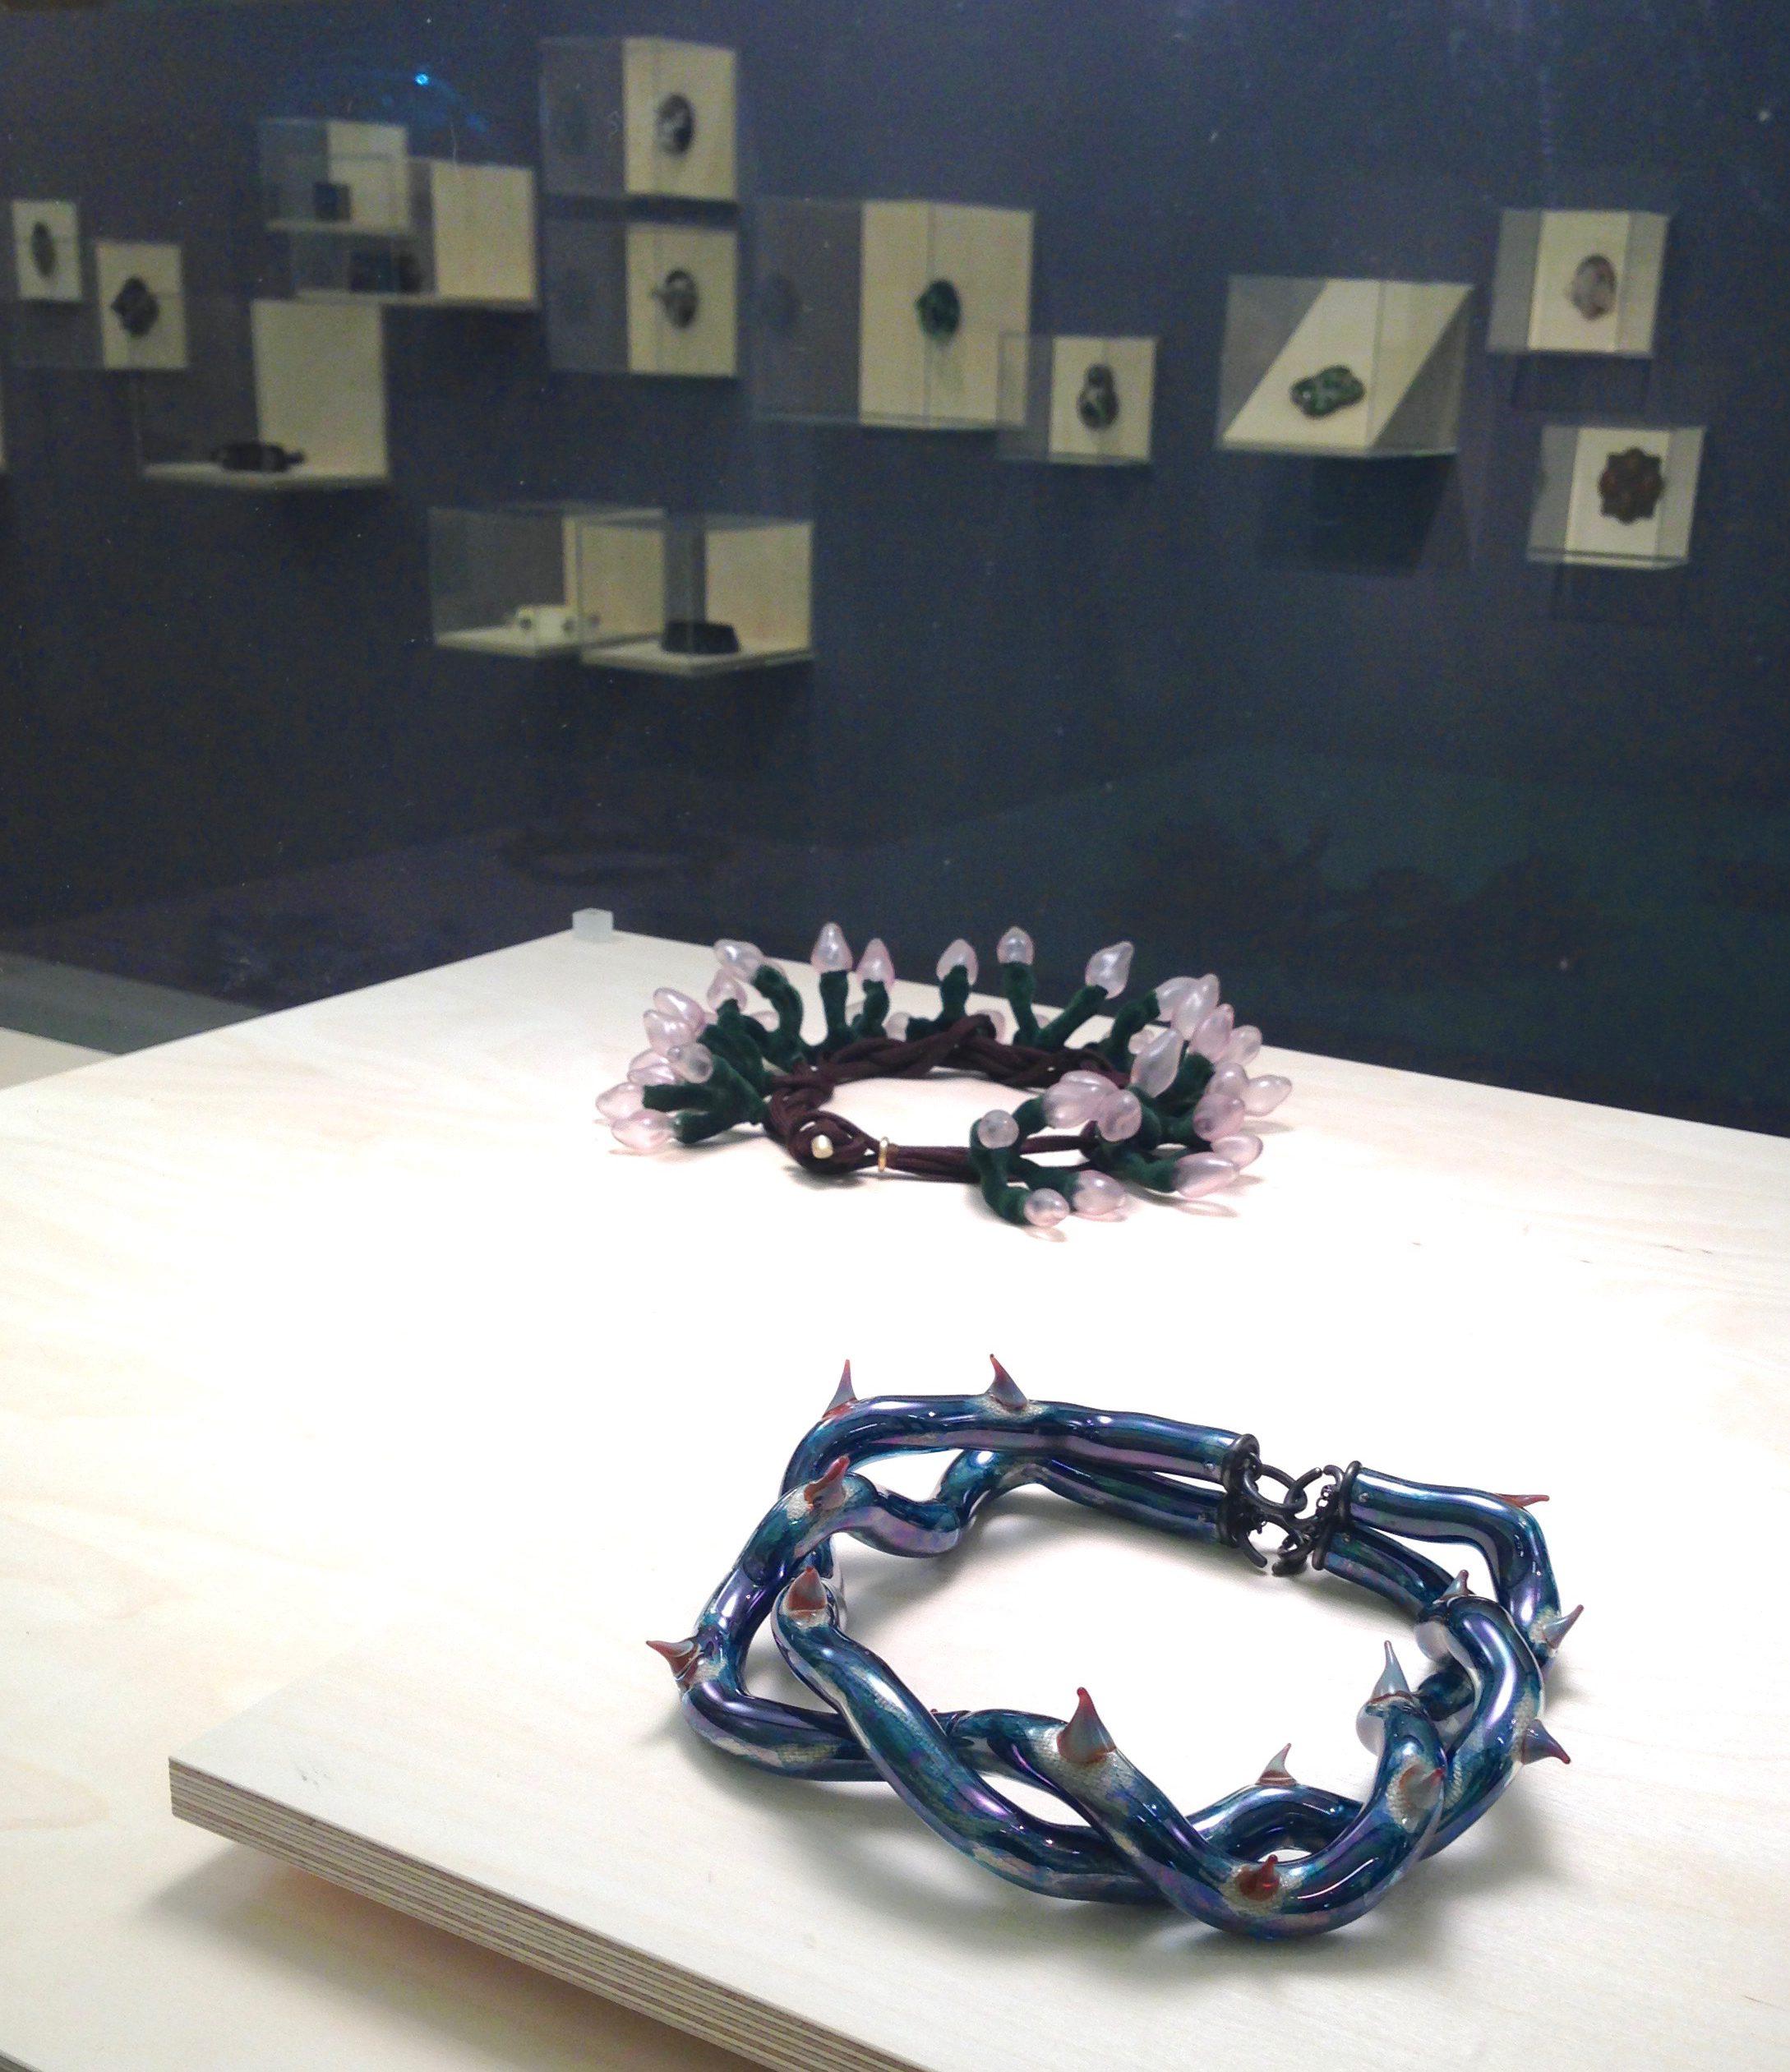 Evert Nijland, Vernieuwd verleden, CODA, 2016, halssieraden, tentoonstelling, vitrines